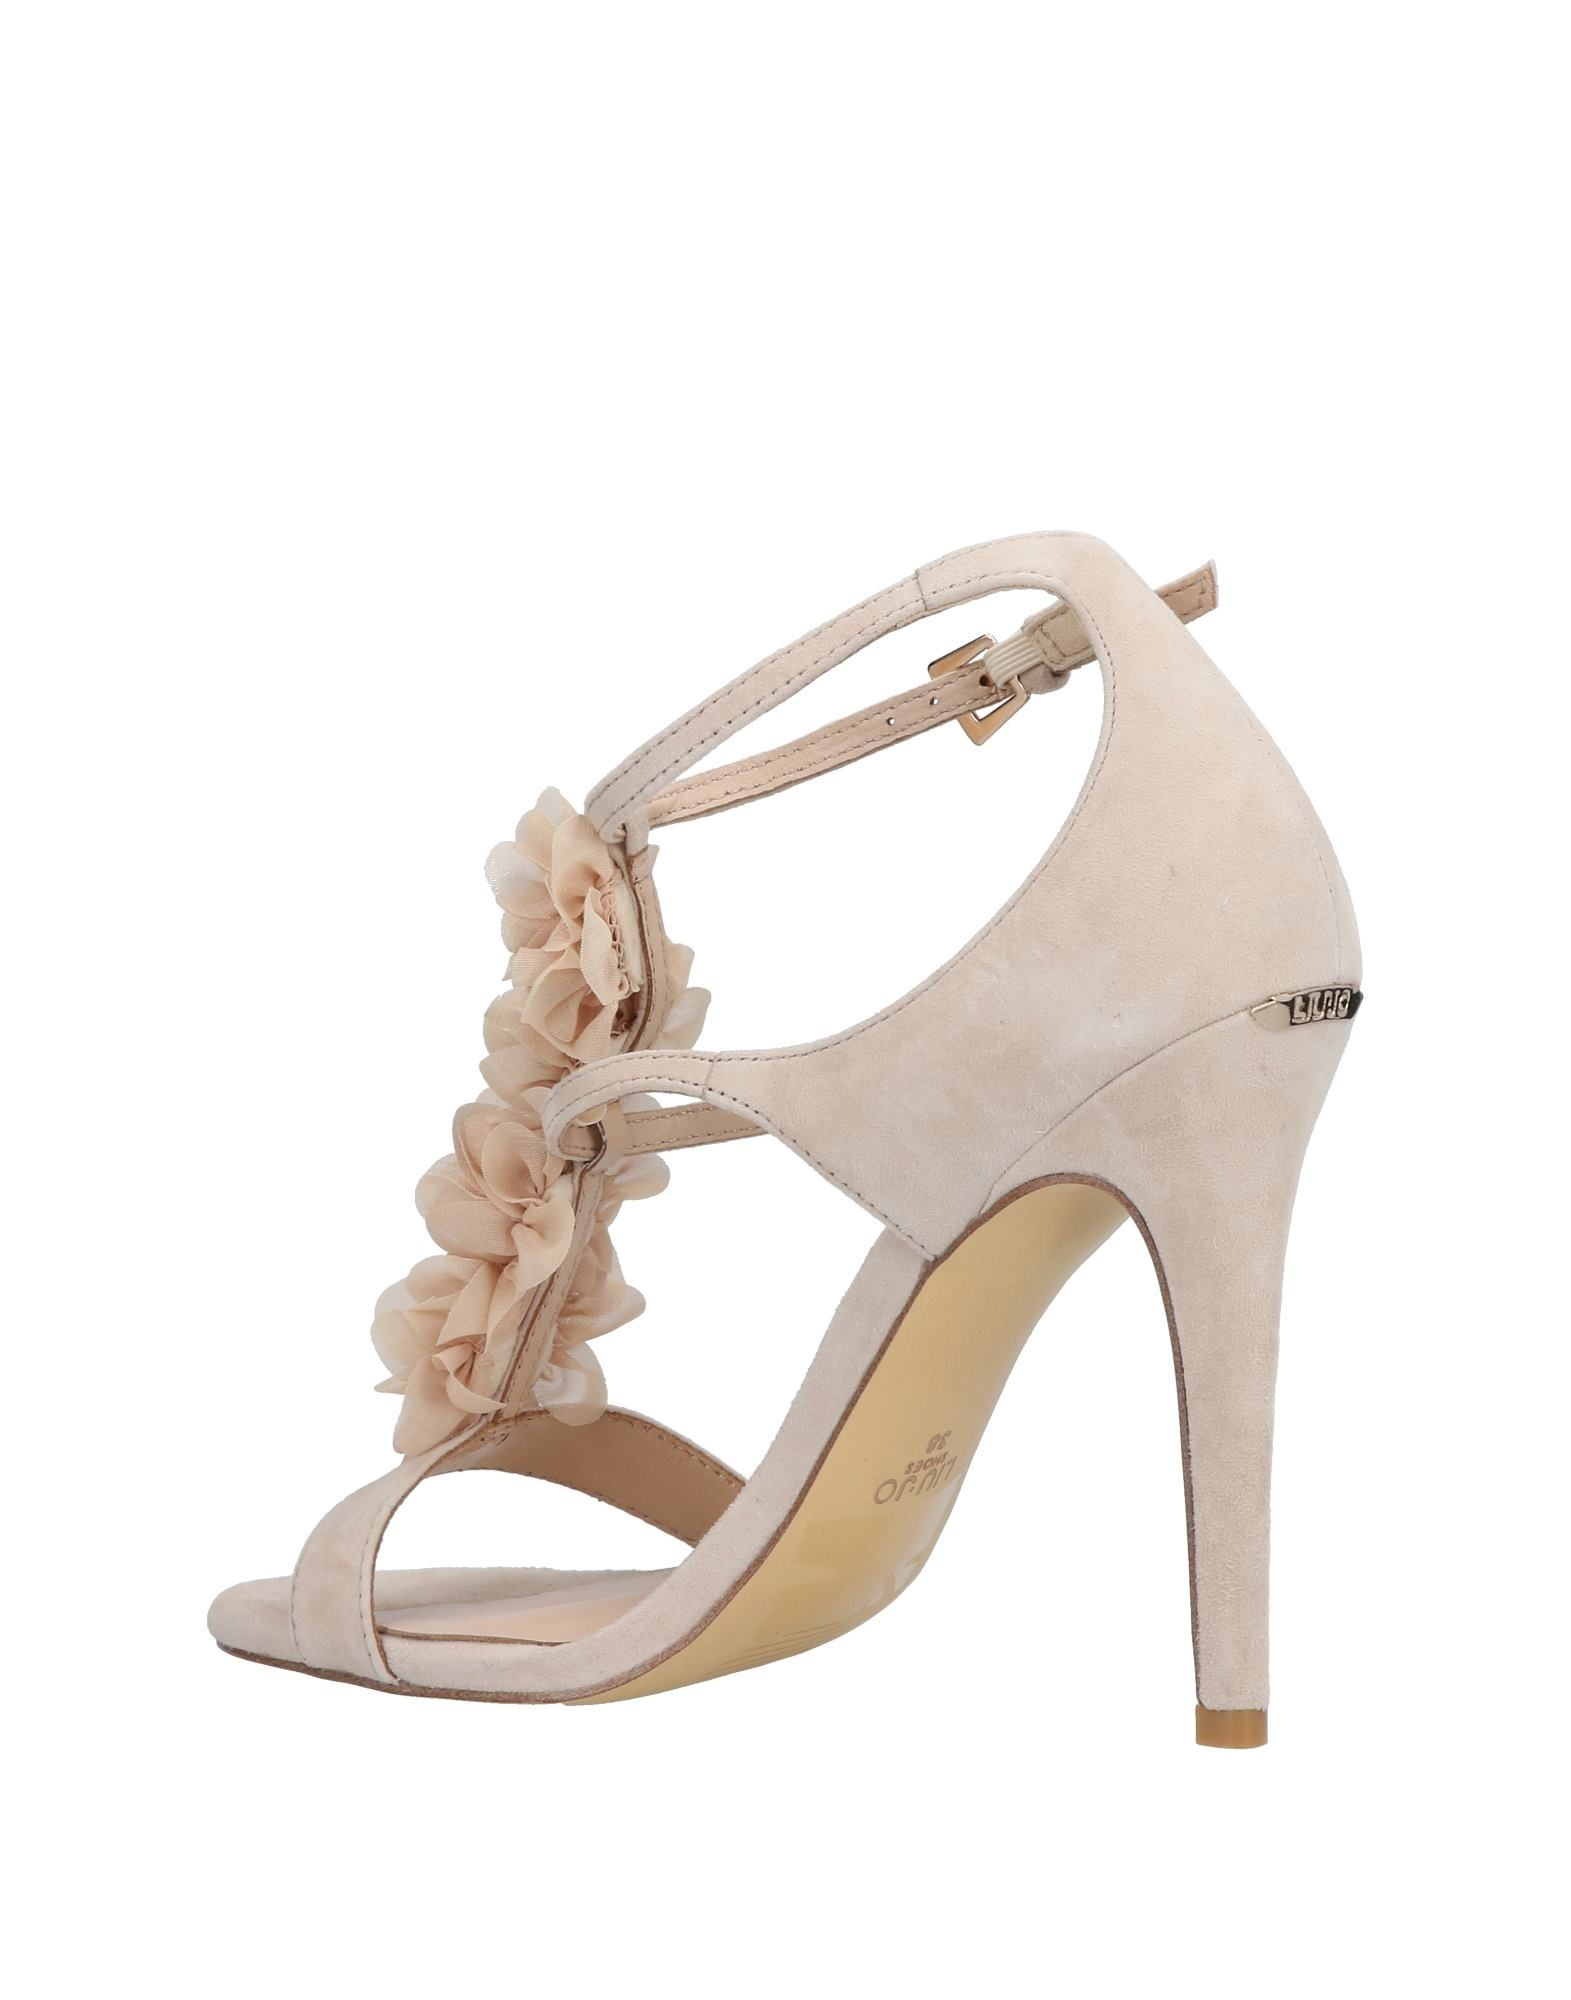 Liu 11481777HW •Jo Schuhes Sandalen Damen 11481777HW Liu Gute Qualität beliebte Schuhe 2f083d